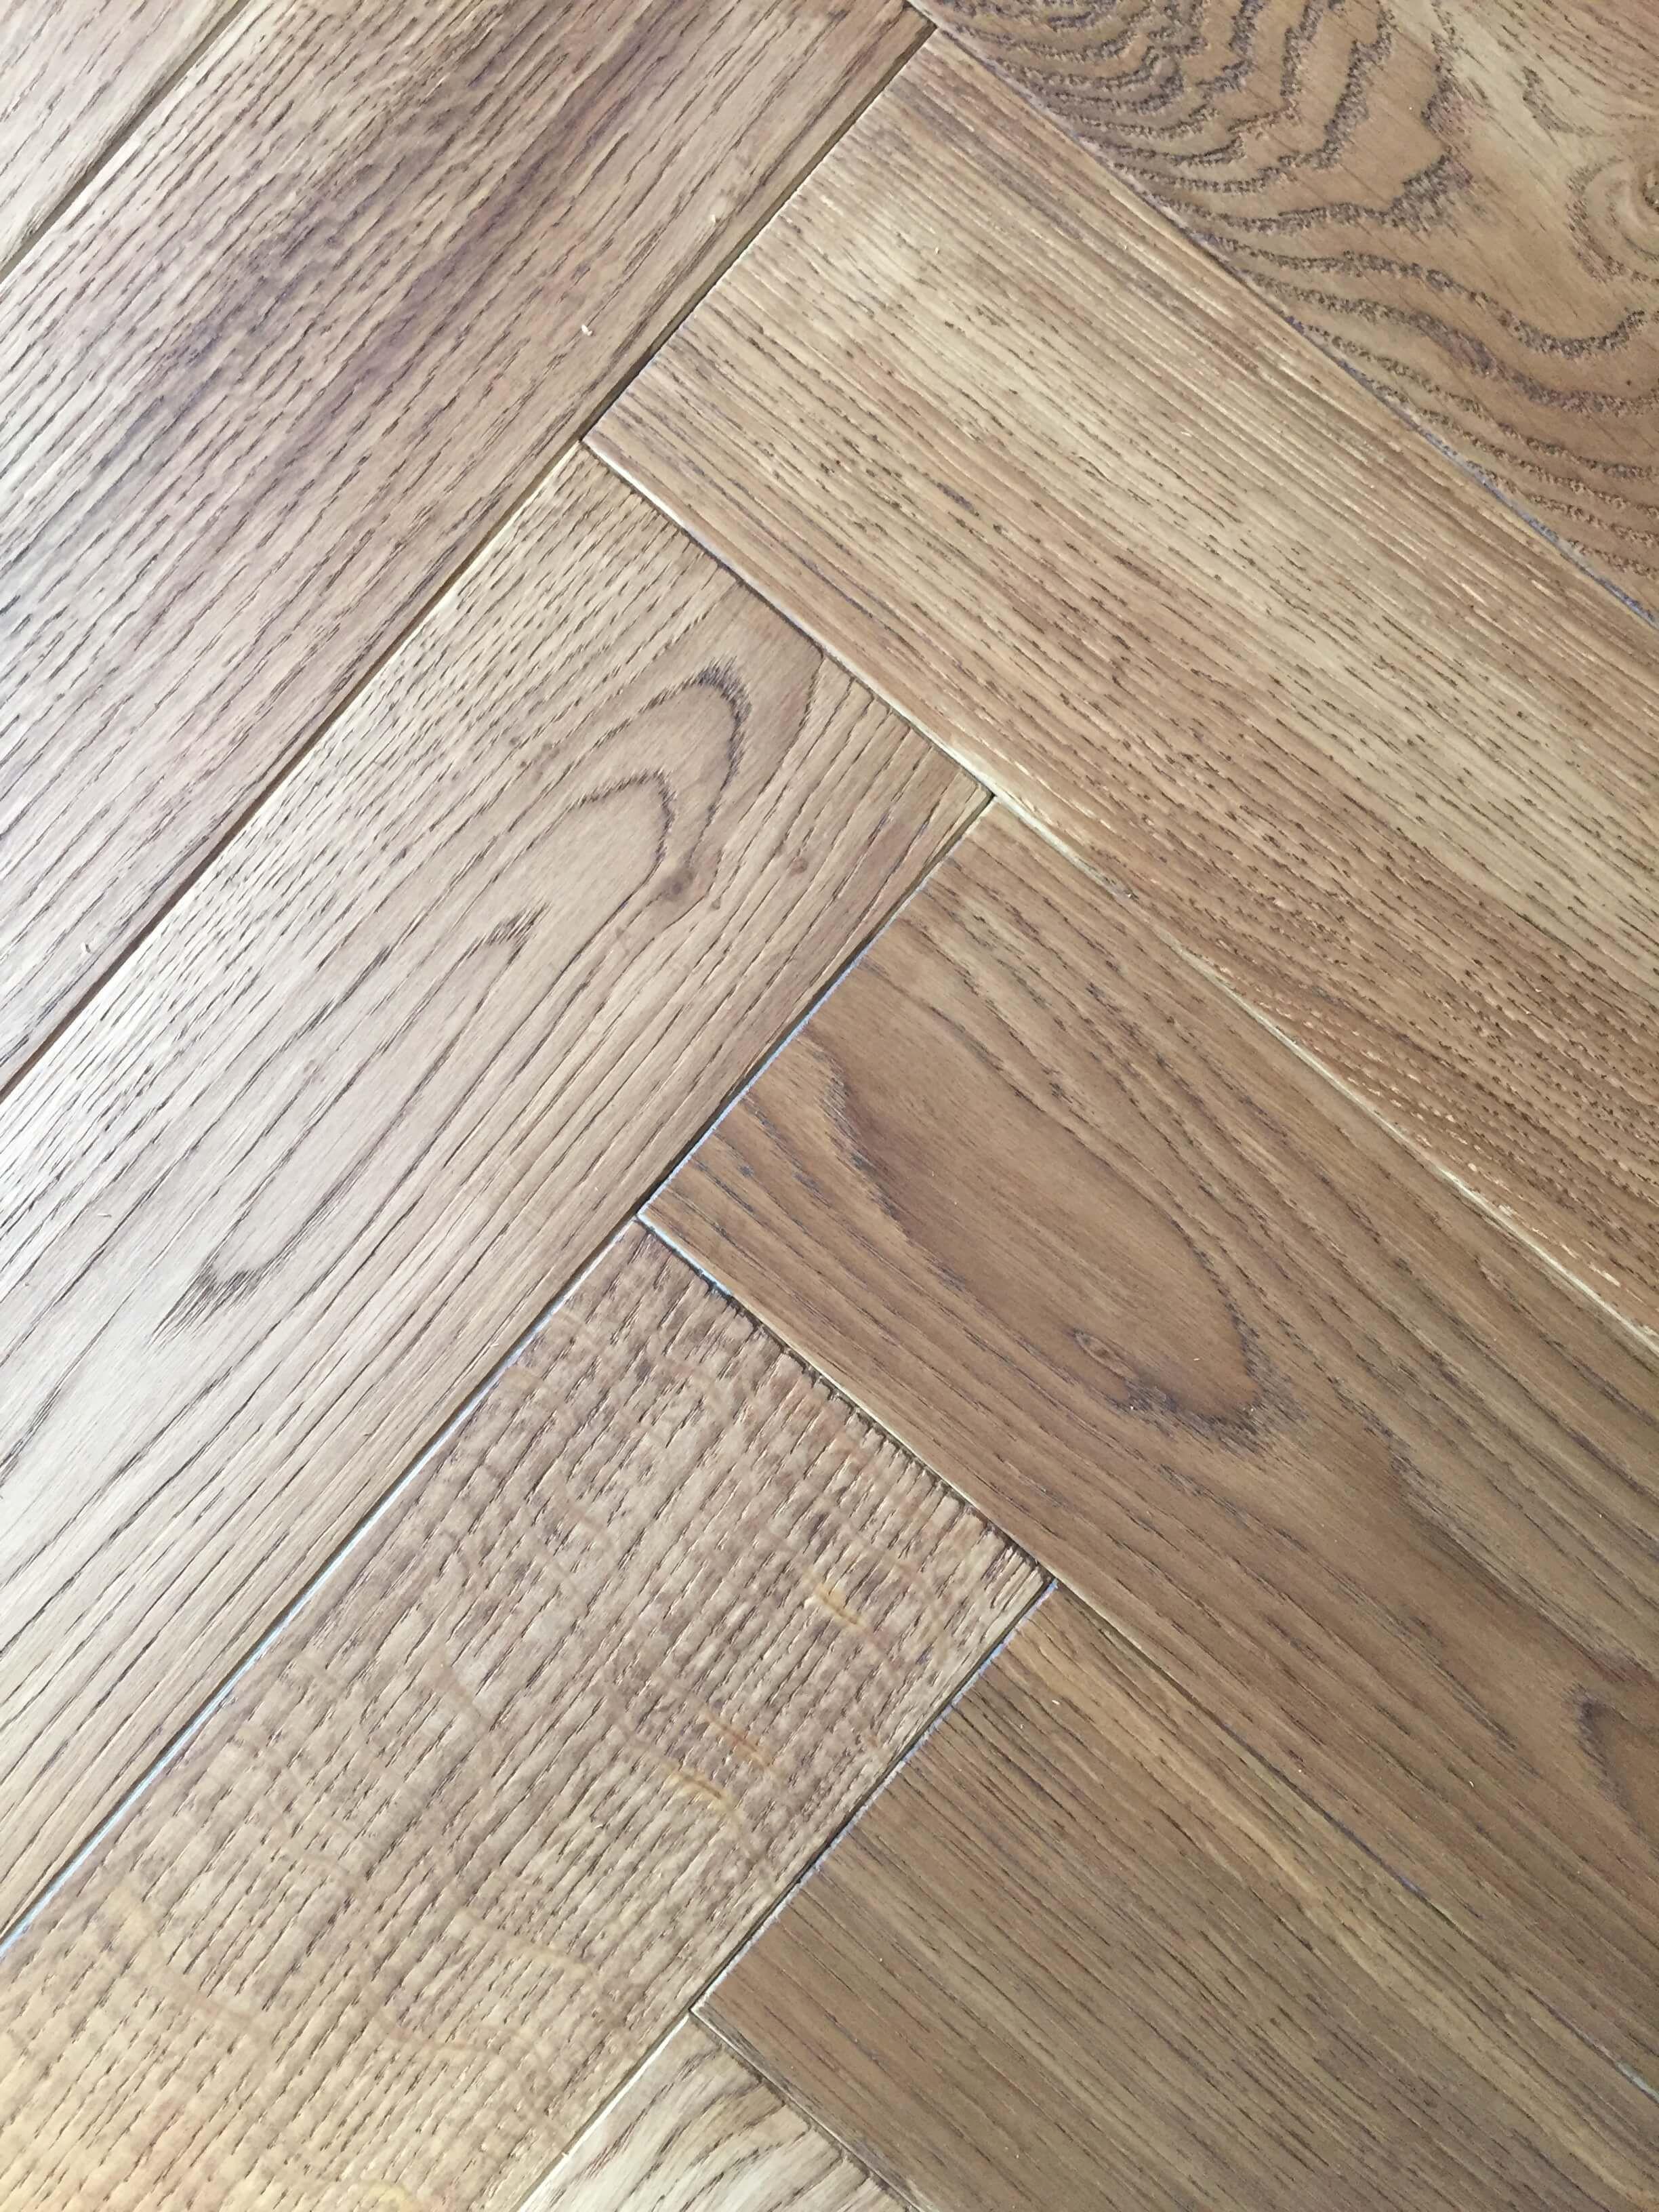 manufactured hardwood floor cleaner of laminate hardwood flooring stanley park kraus laminate flooring within 40 light oak engineered hardwood flooring ideas